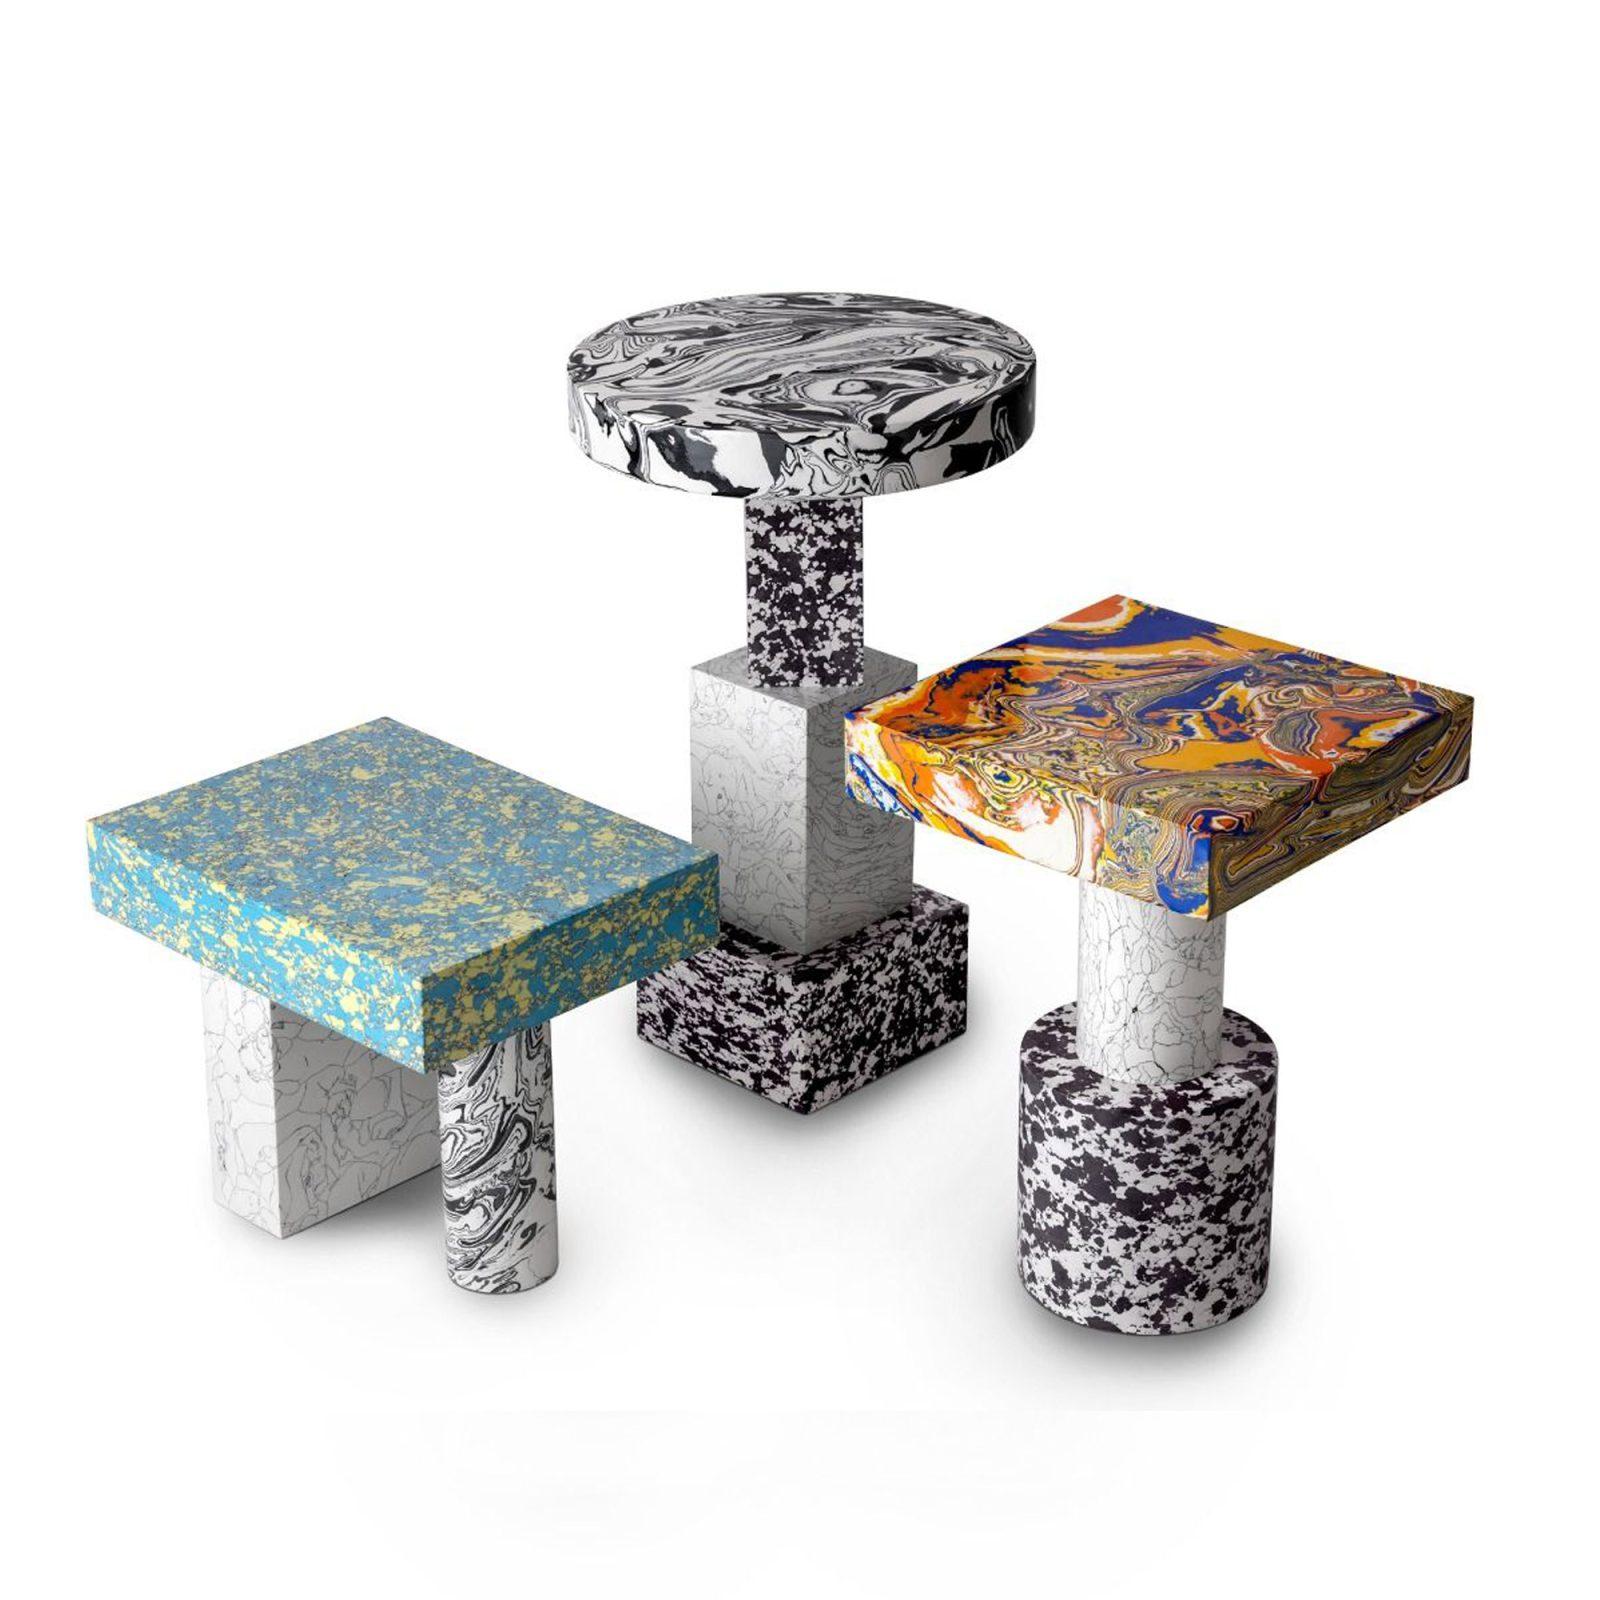 tom-dixon-swirl-collection-table-medium-5